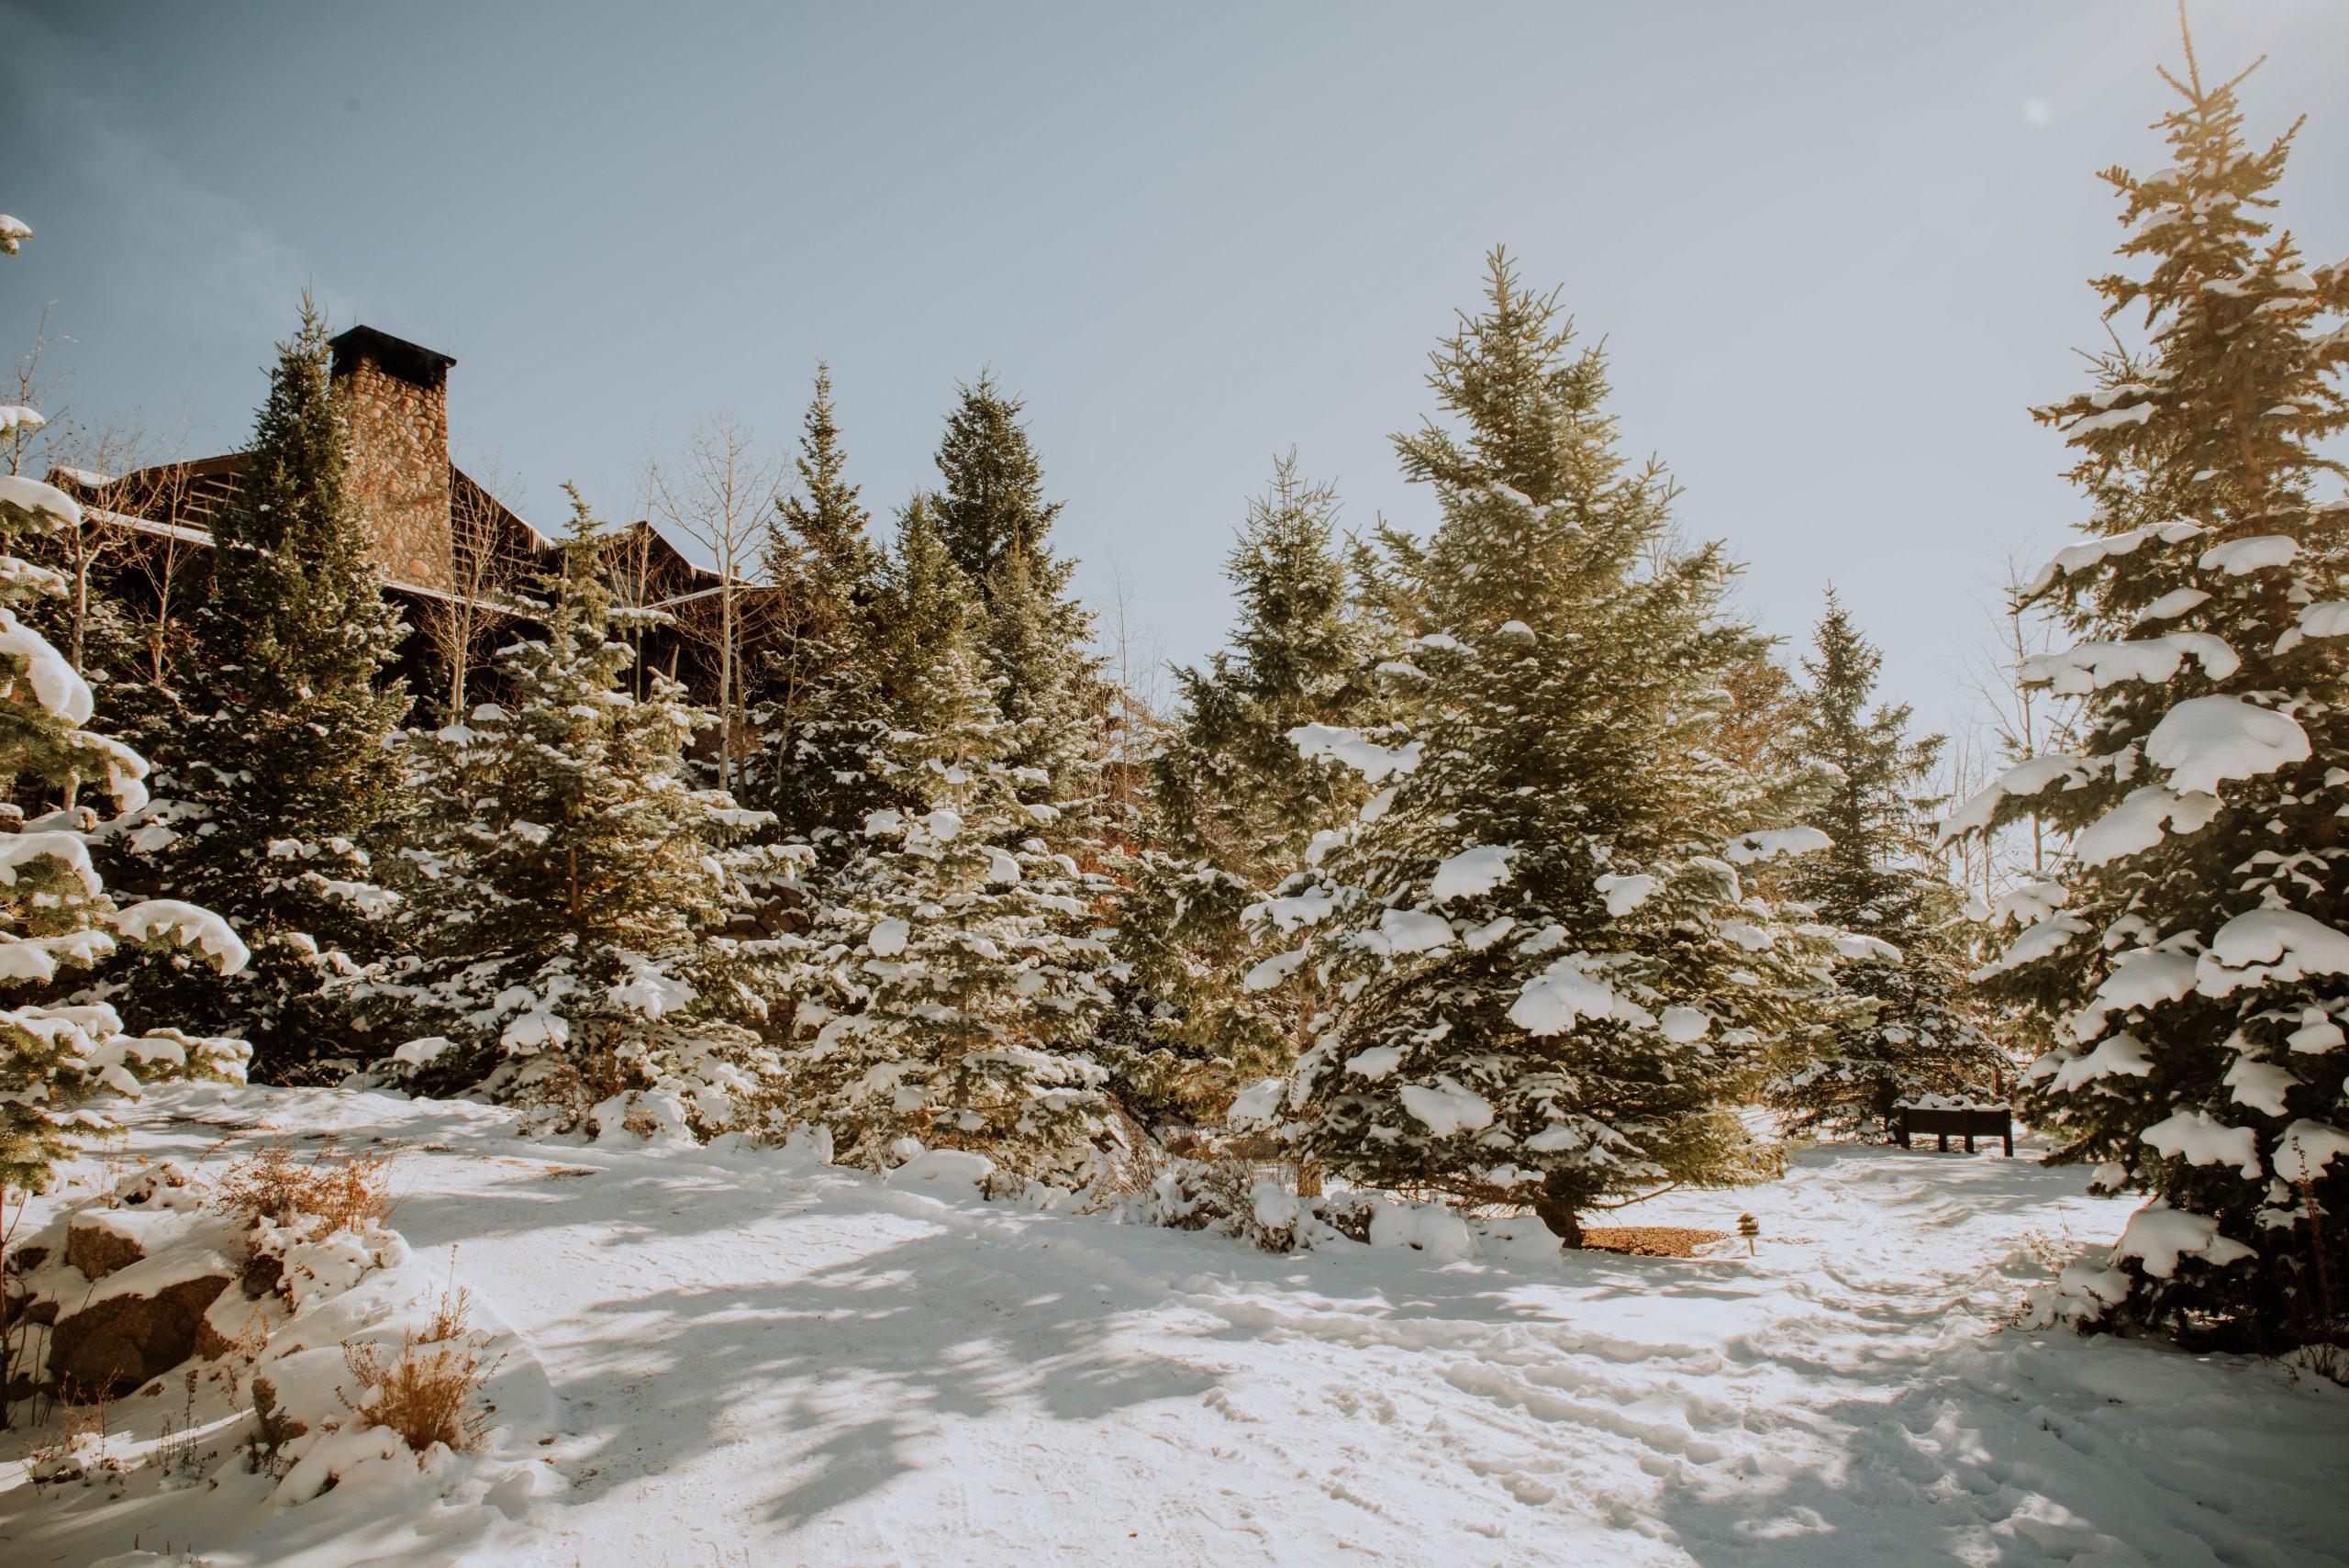 The Broadmoor cloud camp lodge